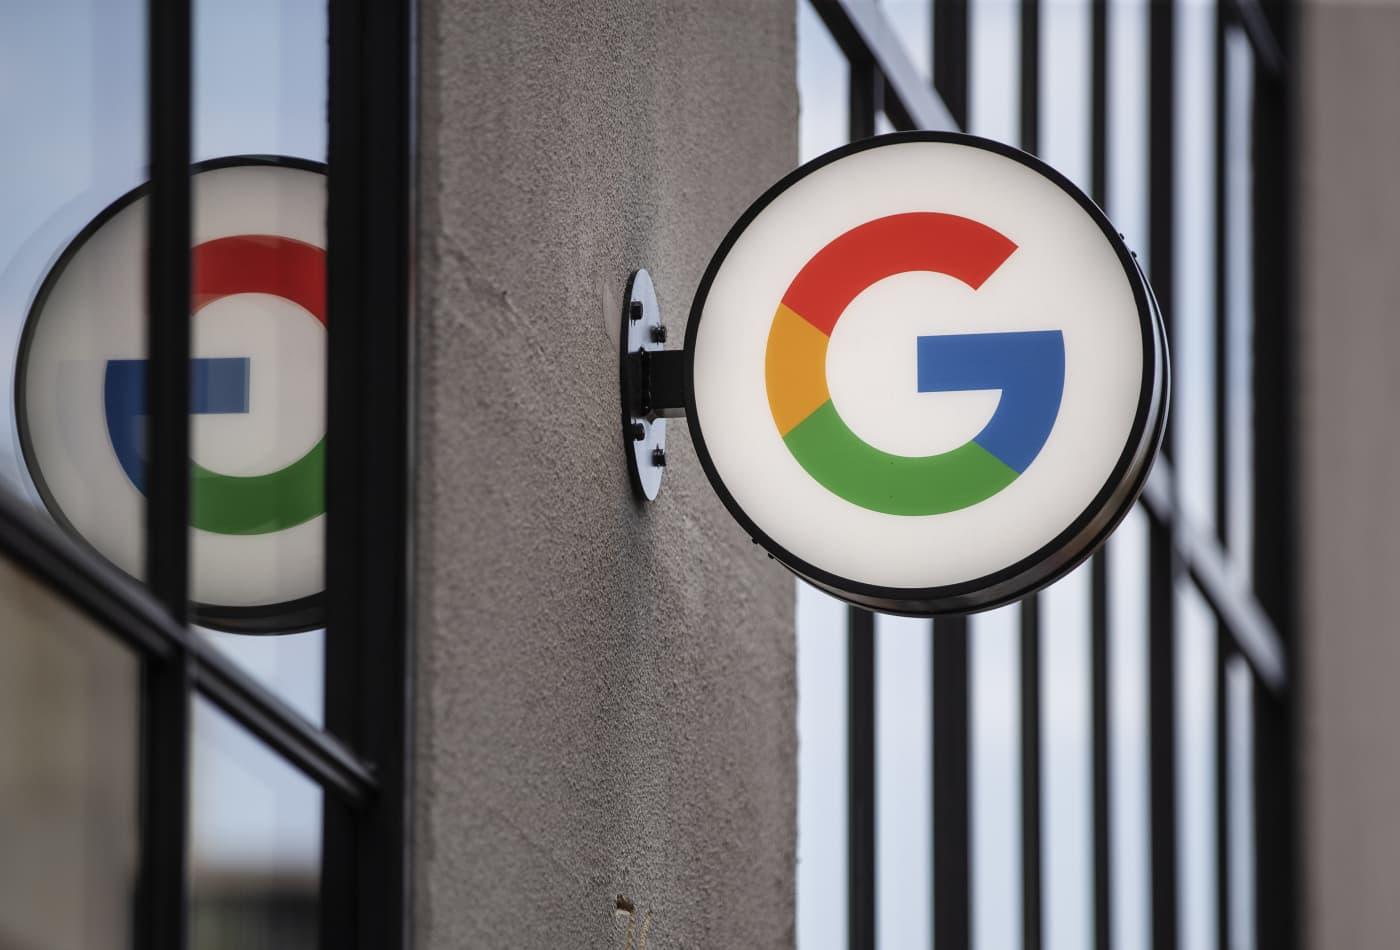 EU opens antitrust probe into Google's advertising unit